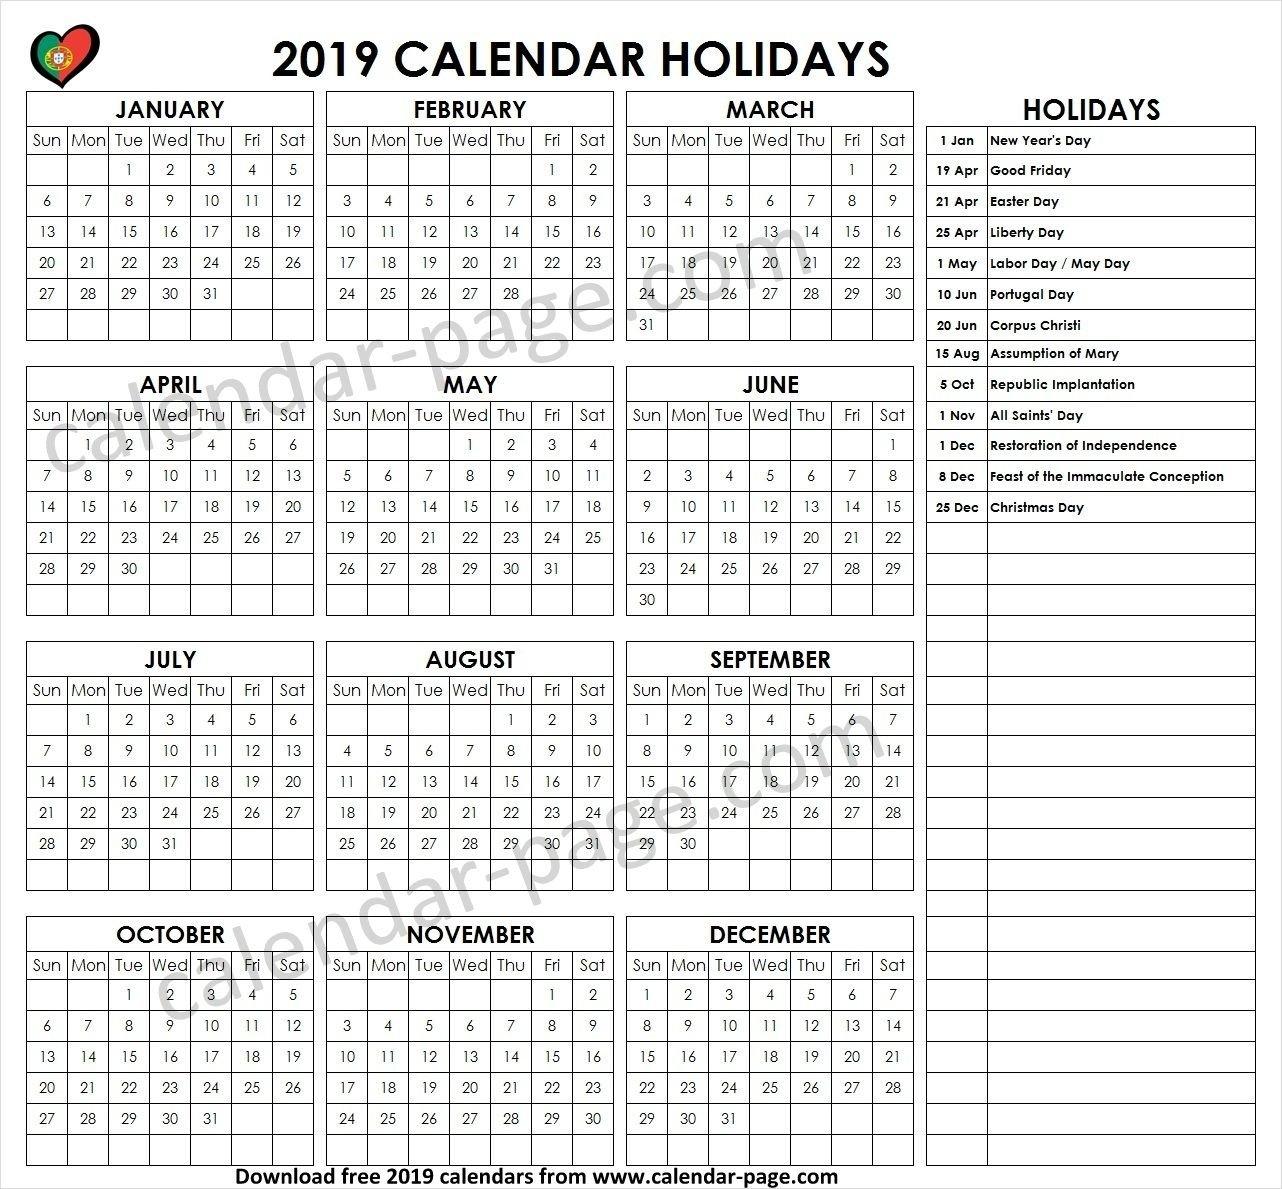 Holiday Calendar 2019 Portugal | Holiday Calendar 2019 | Pinterest Calendar 2019 Labor Day